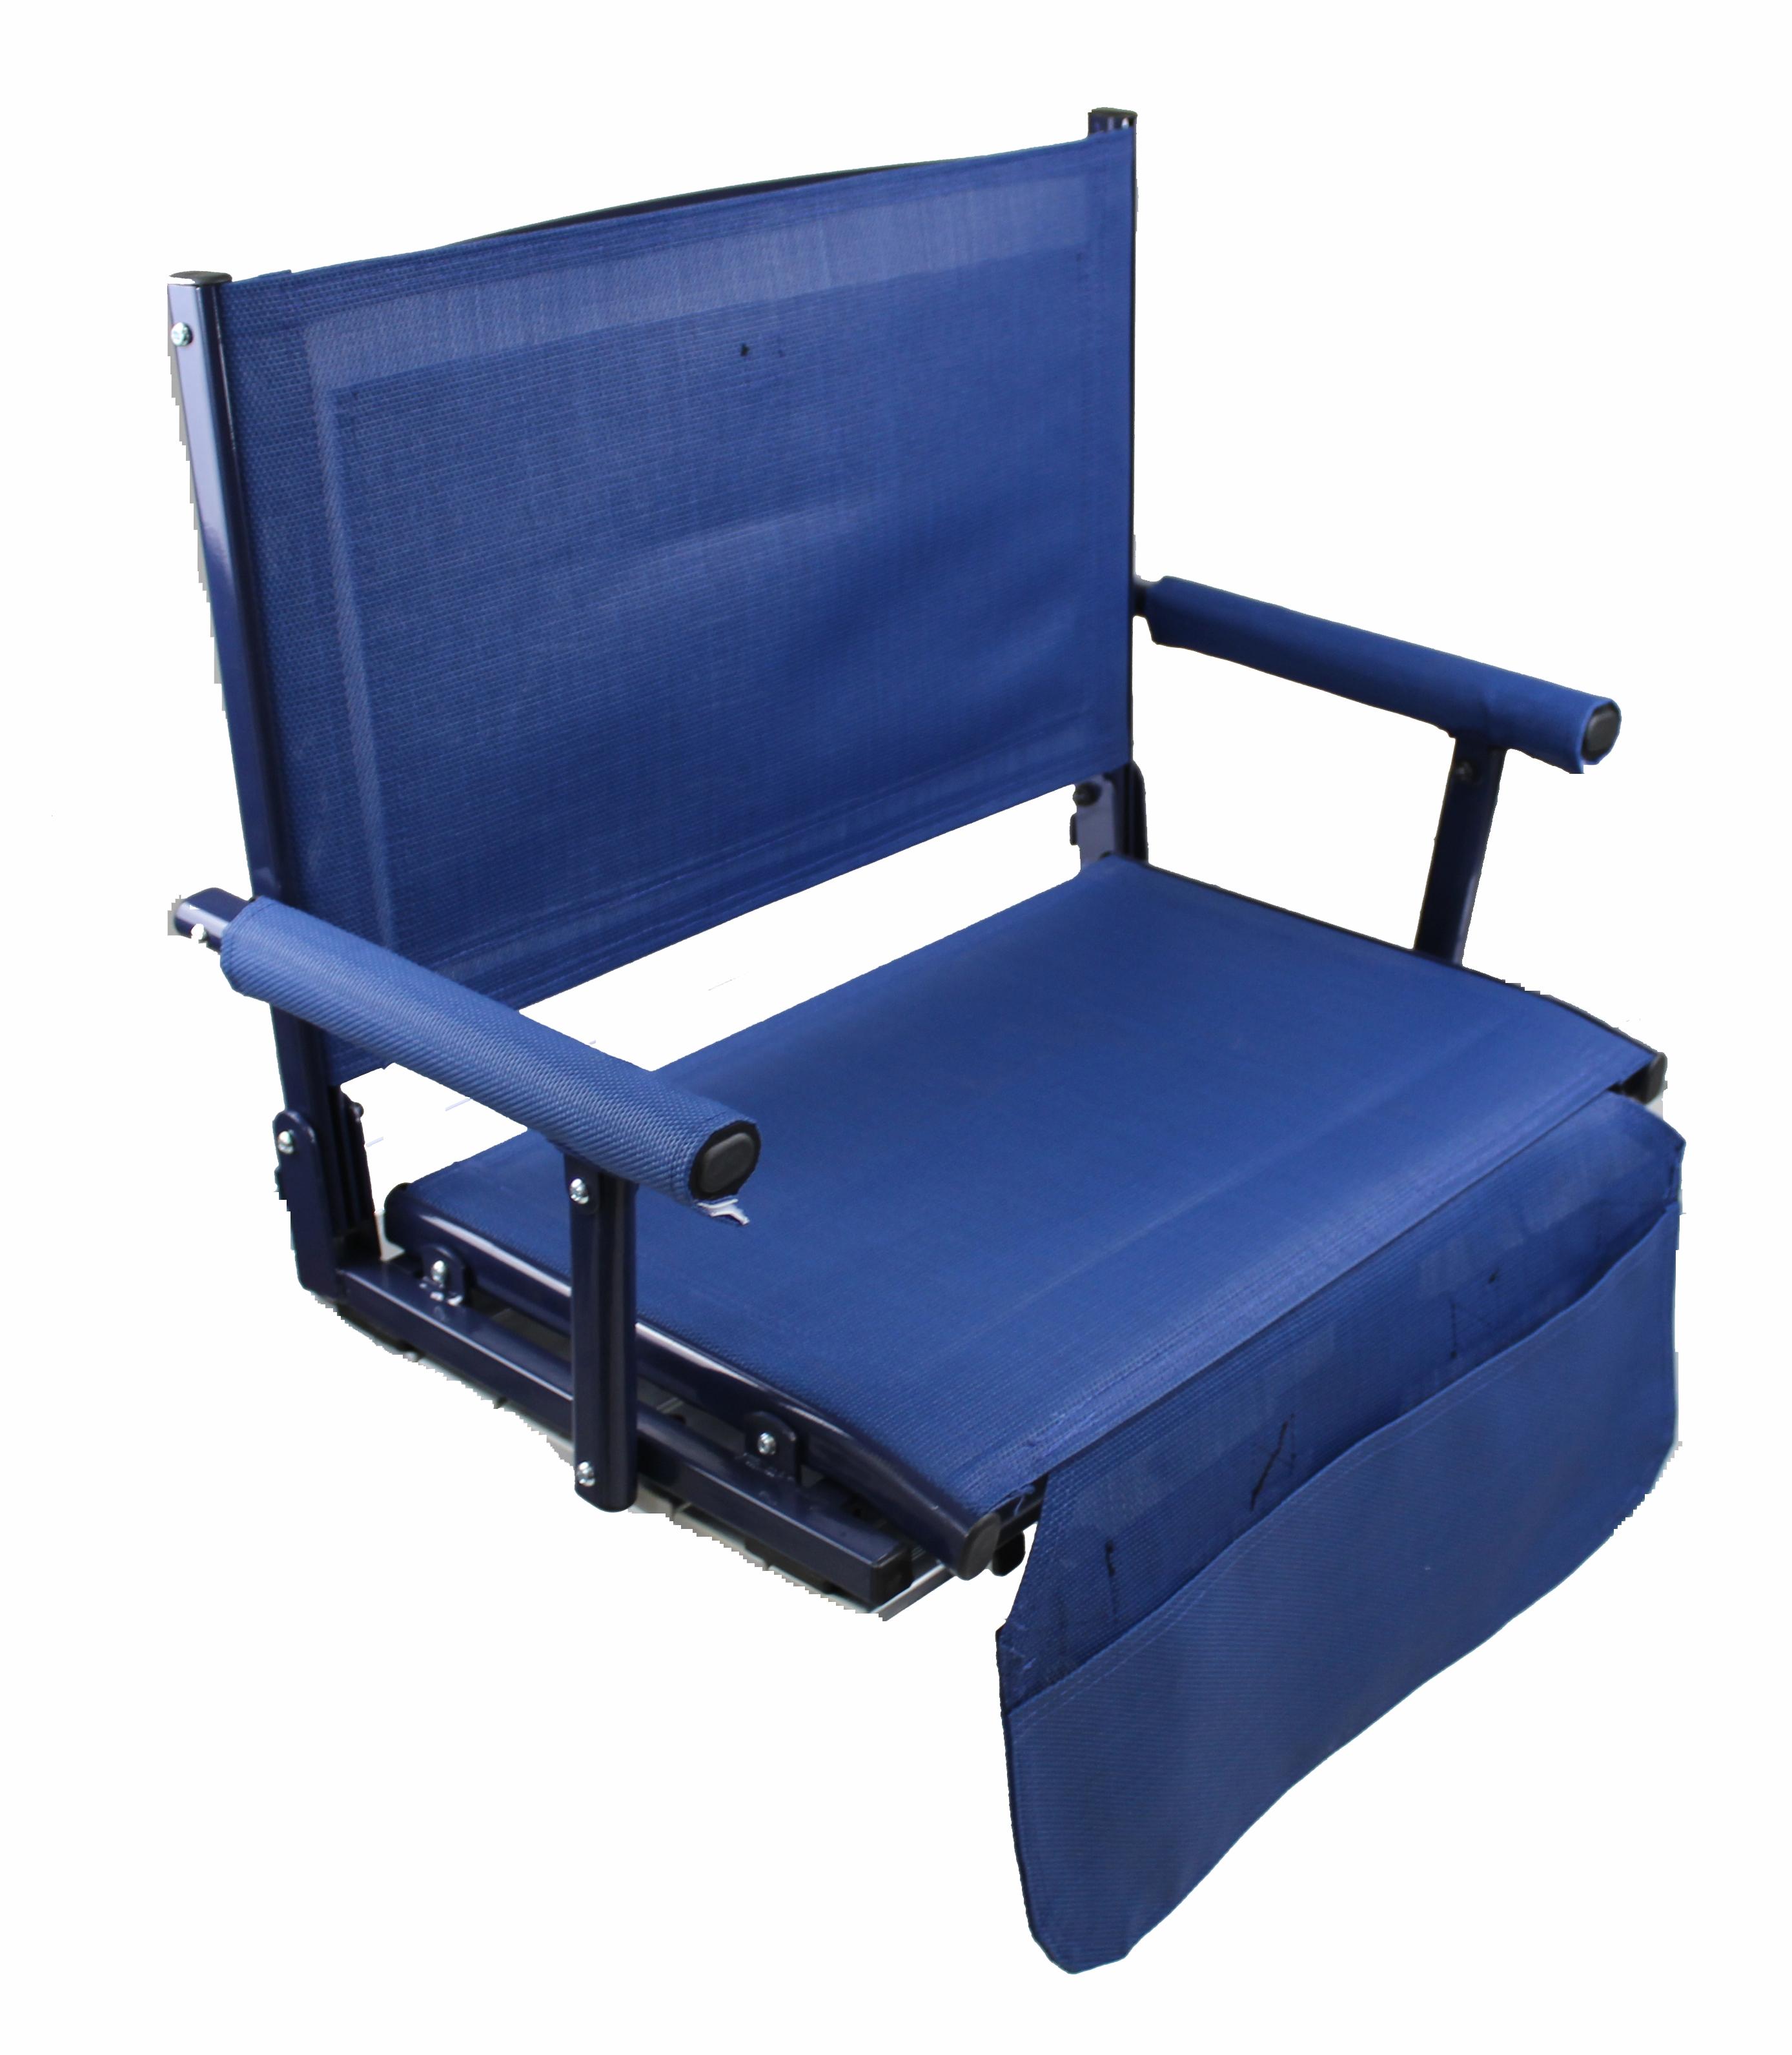 Custom Stadium Chairs for Bleachers Wide Bleacher Bum Stadium Seat by Pacific Imports